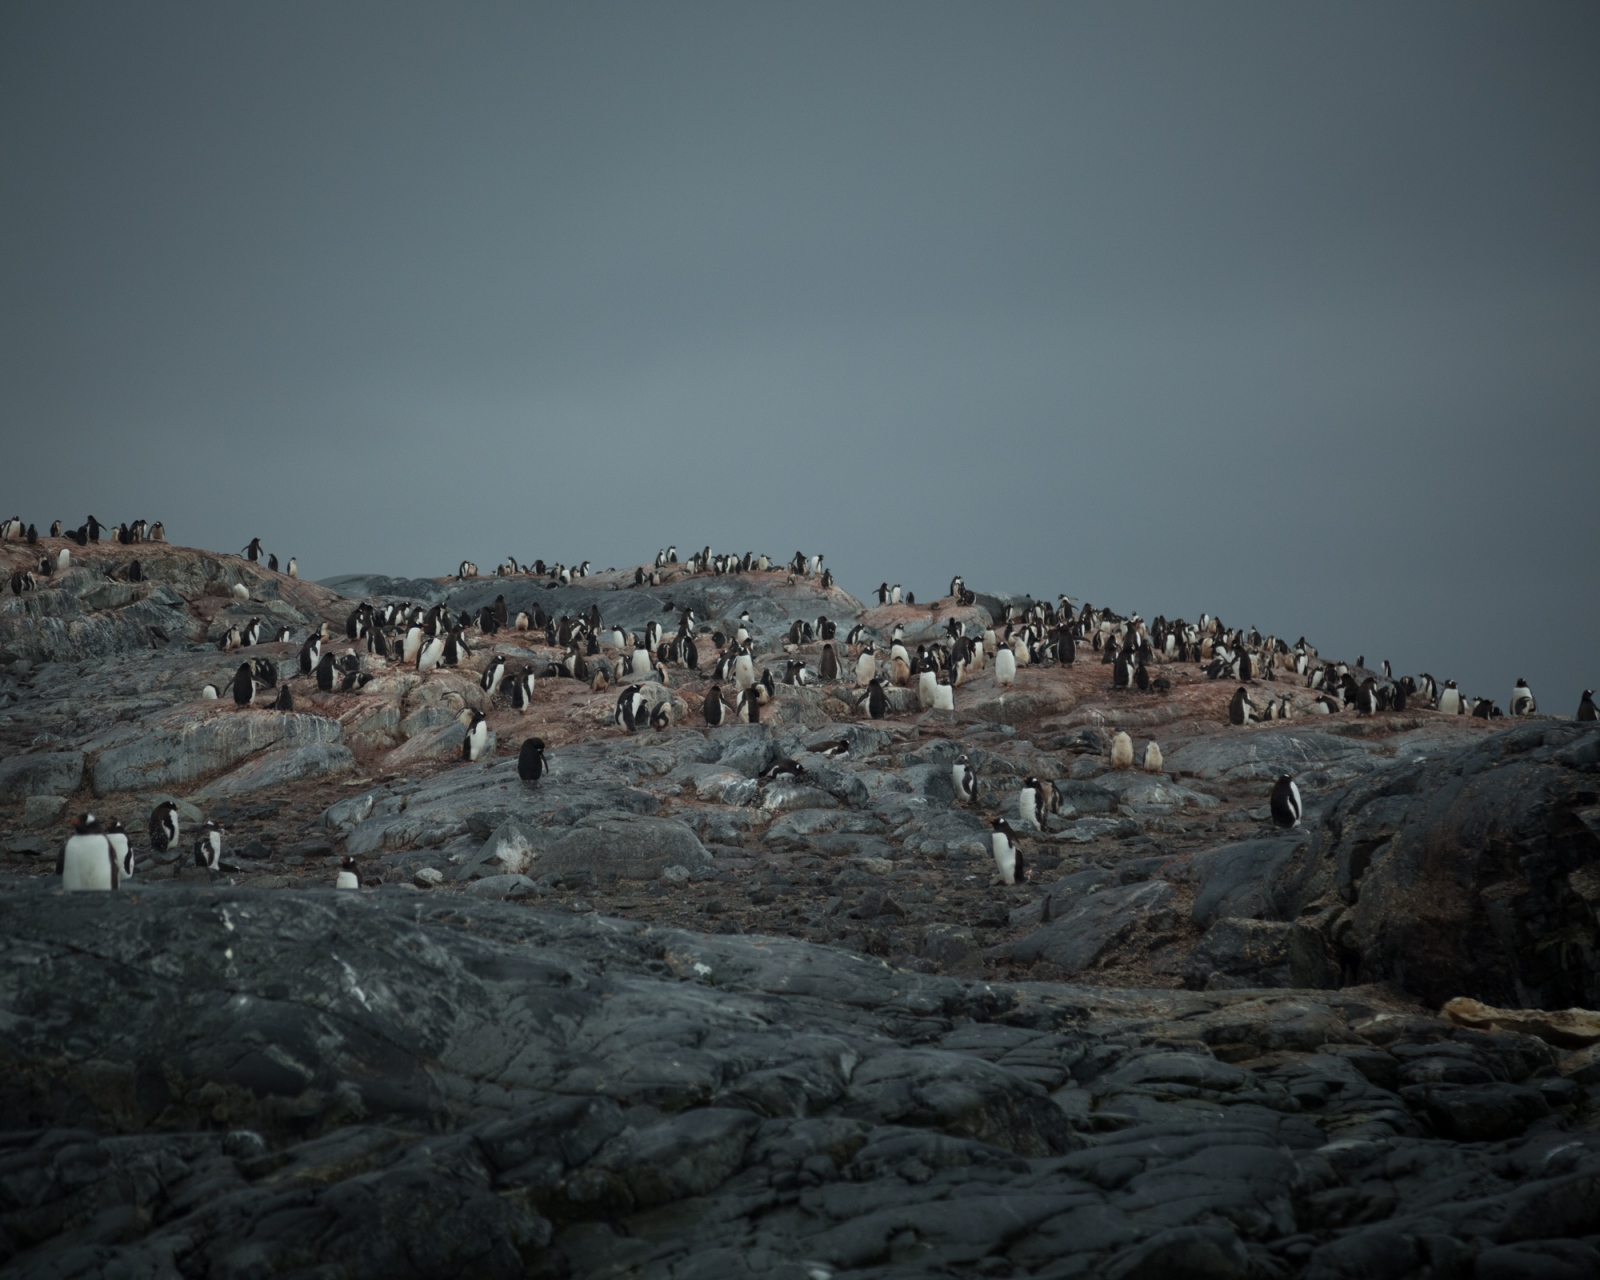 Late in the breeding season,gentoo penguin chicks scatter across an island in Pleneau Bay, Antarctica.